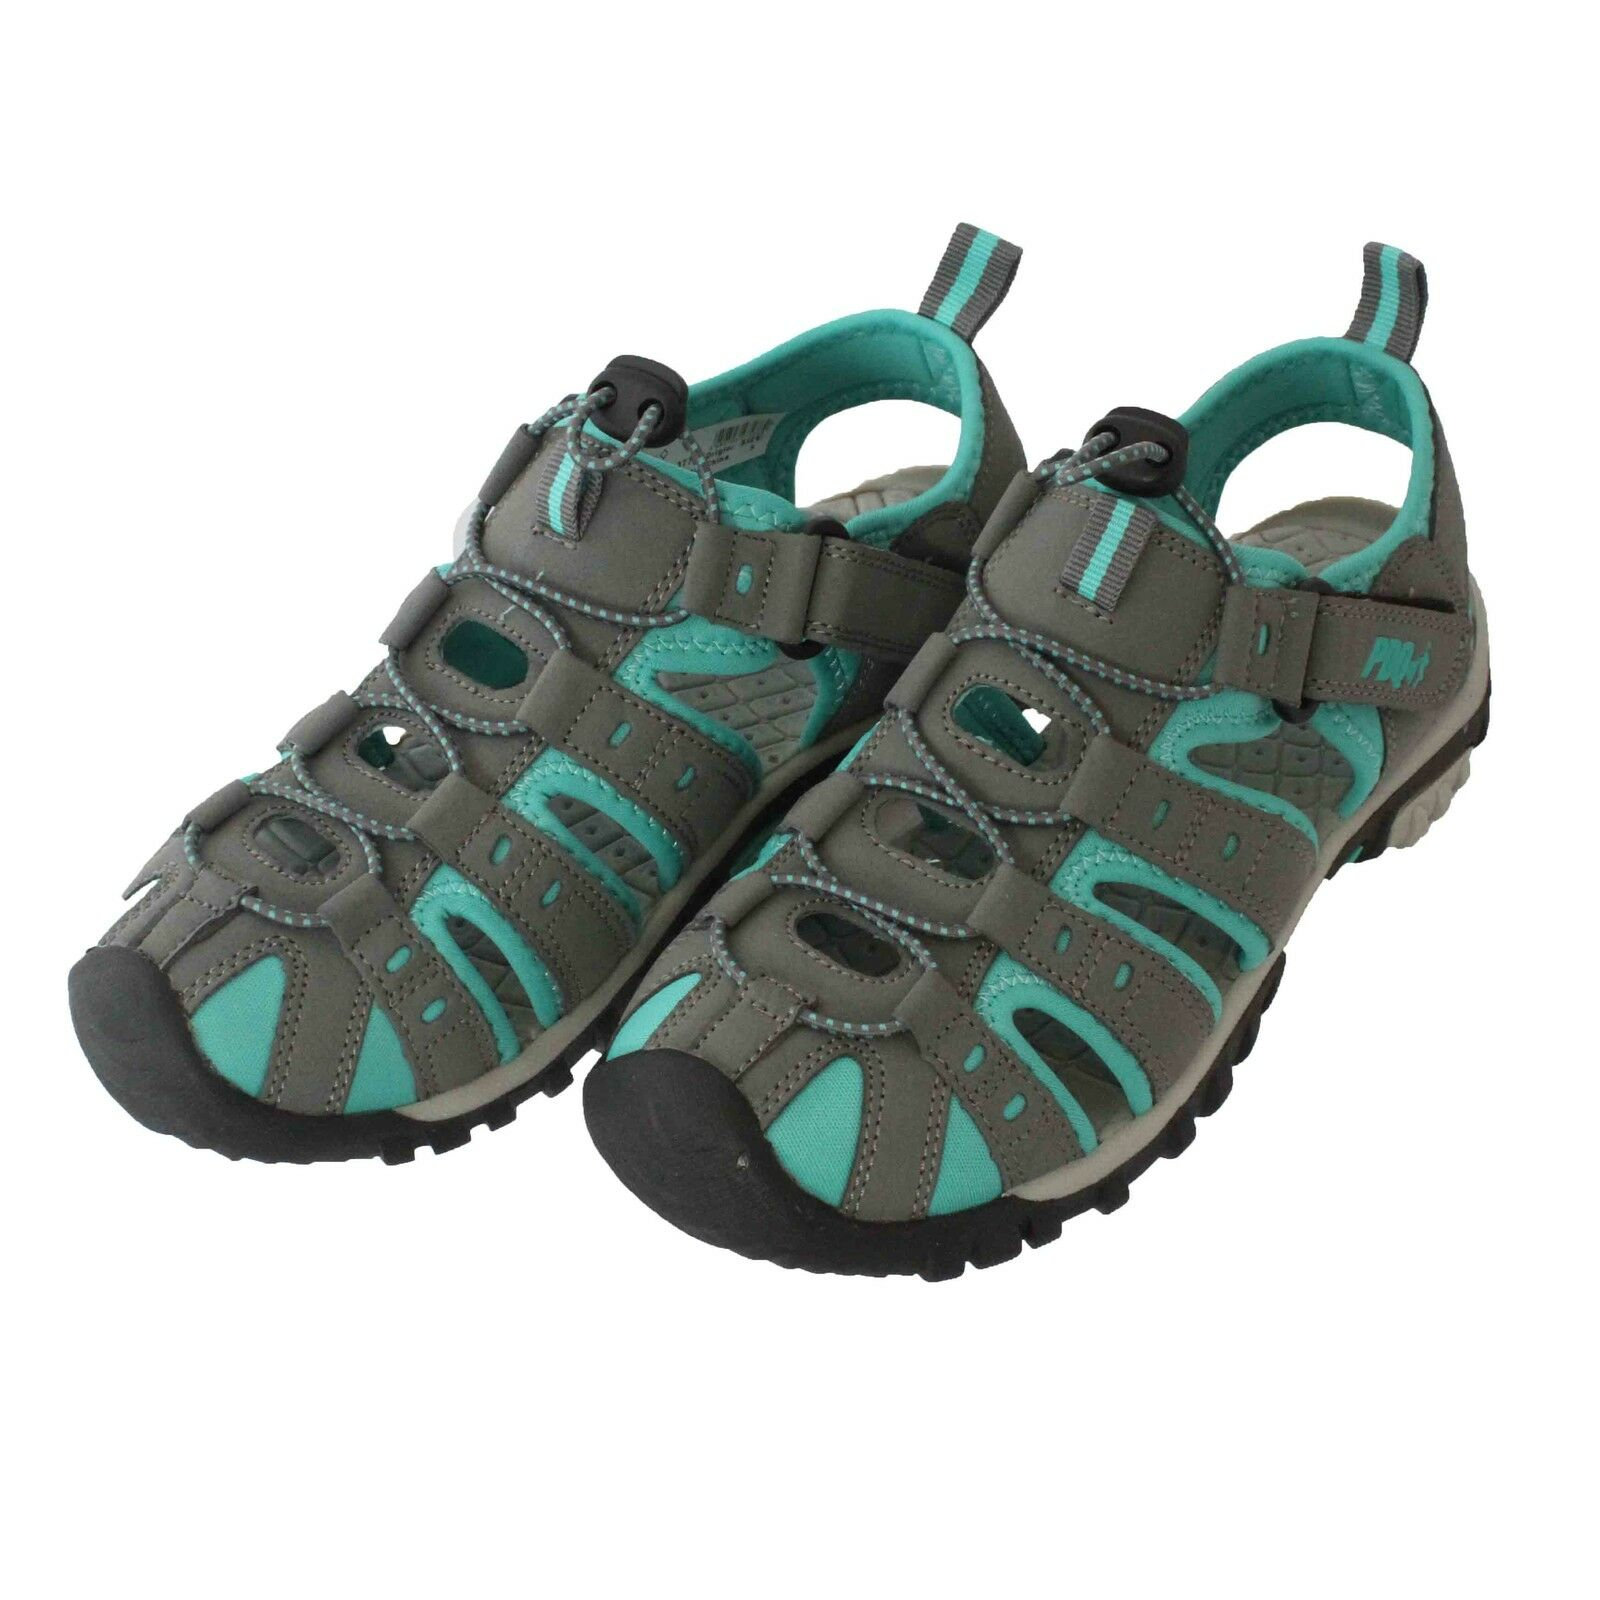 online store 07b6e f0af7 Womens PDQ Walking Hiking Sports Sandal Grey Black Pink Beach Jade  noqzqa3720-Men s Casual